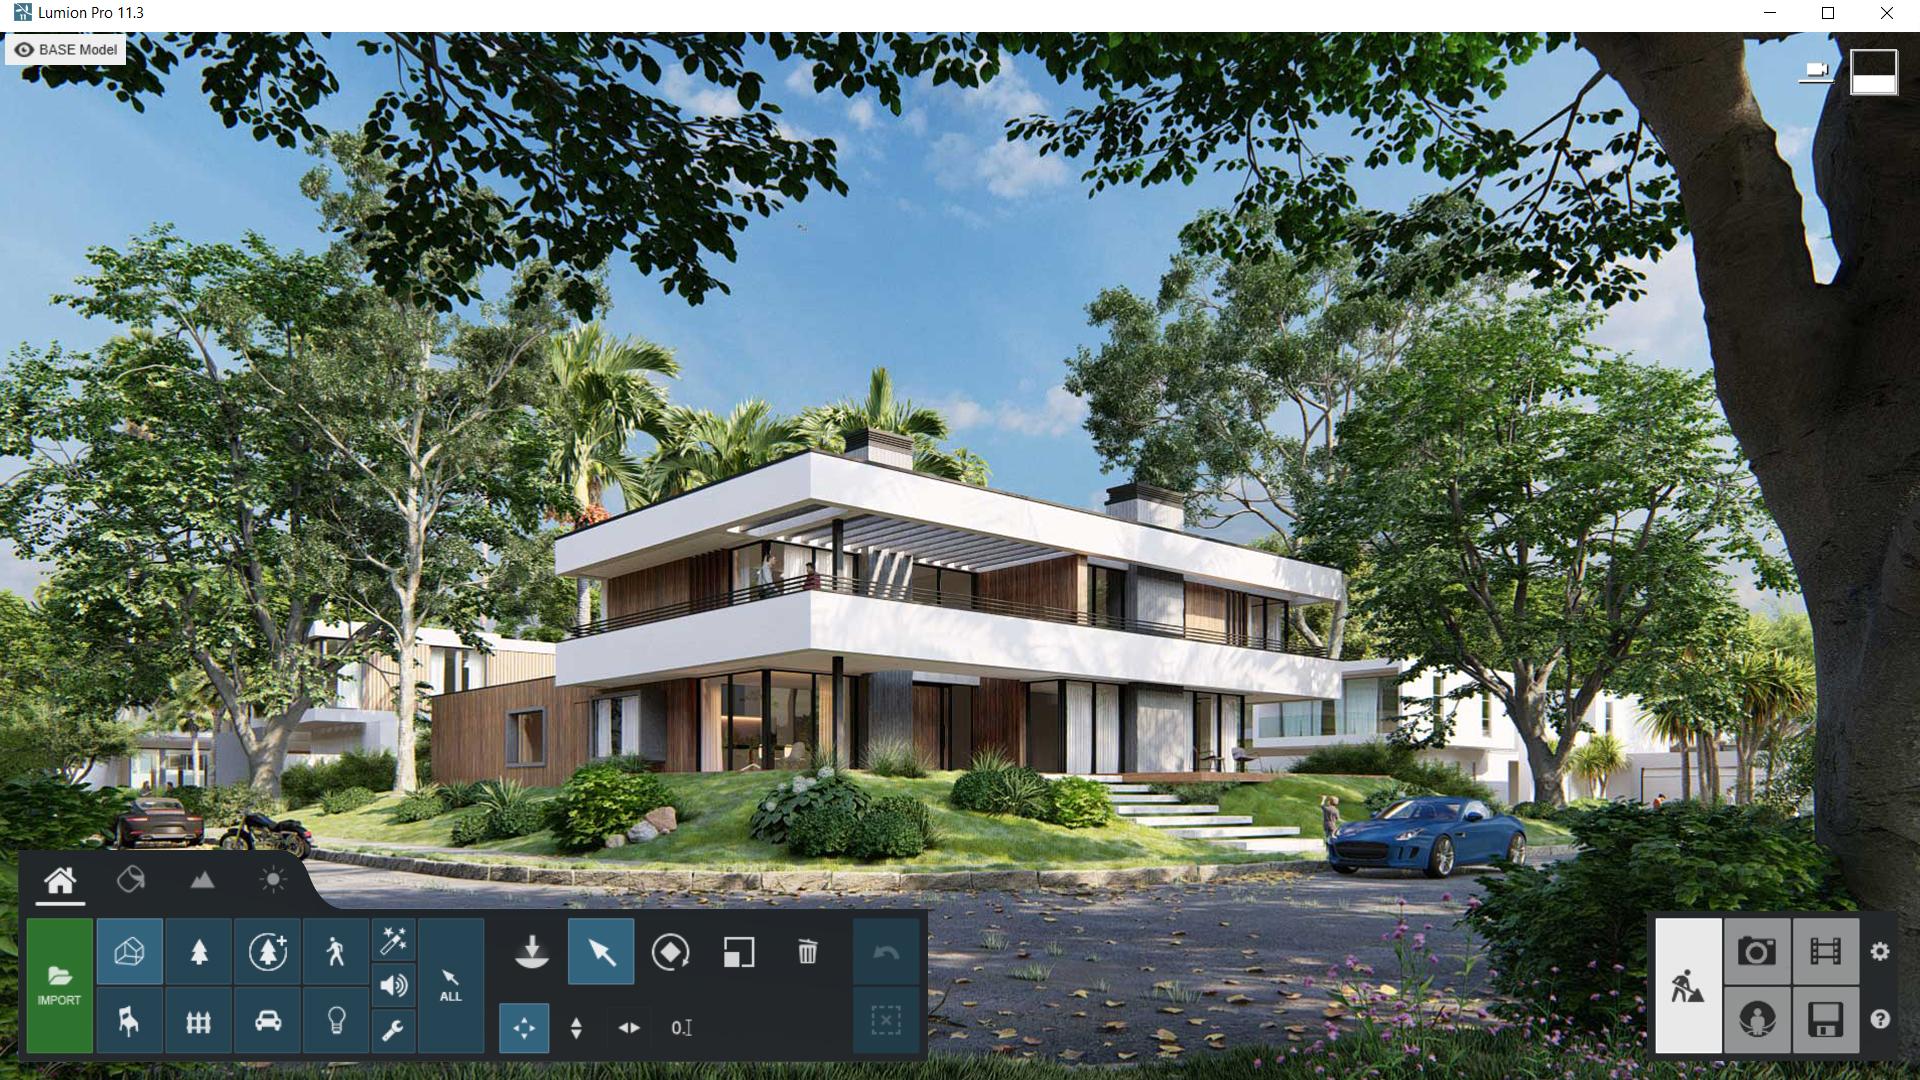 Residential-Exterior-Van-Manen-with editor